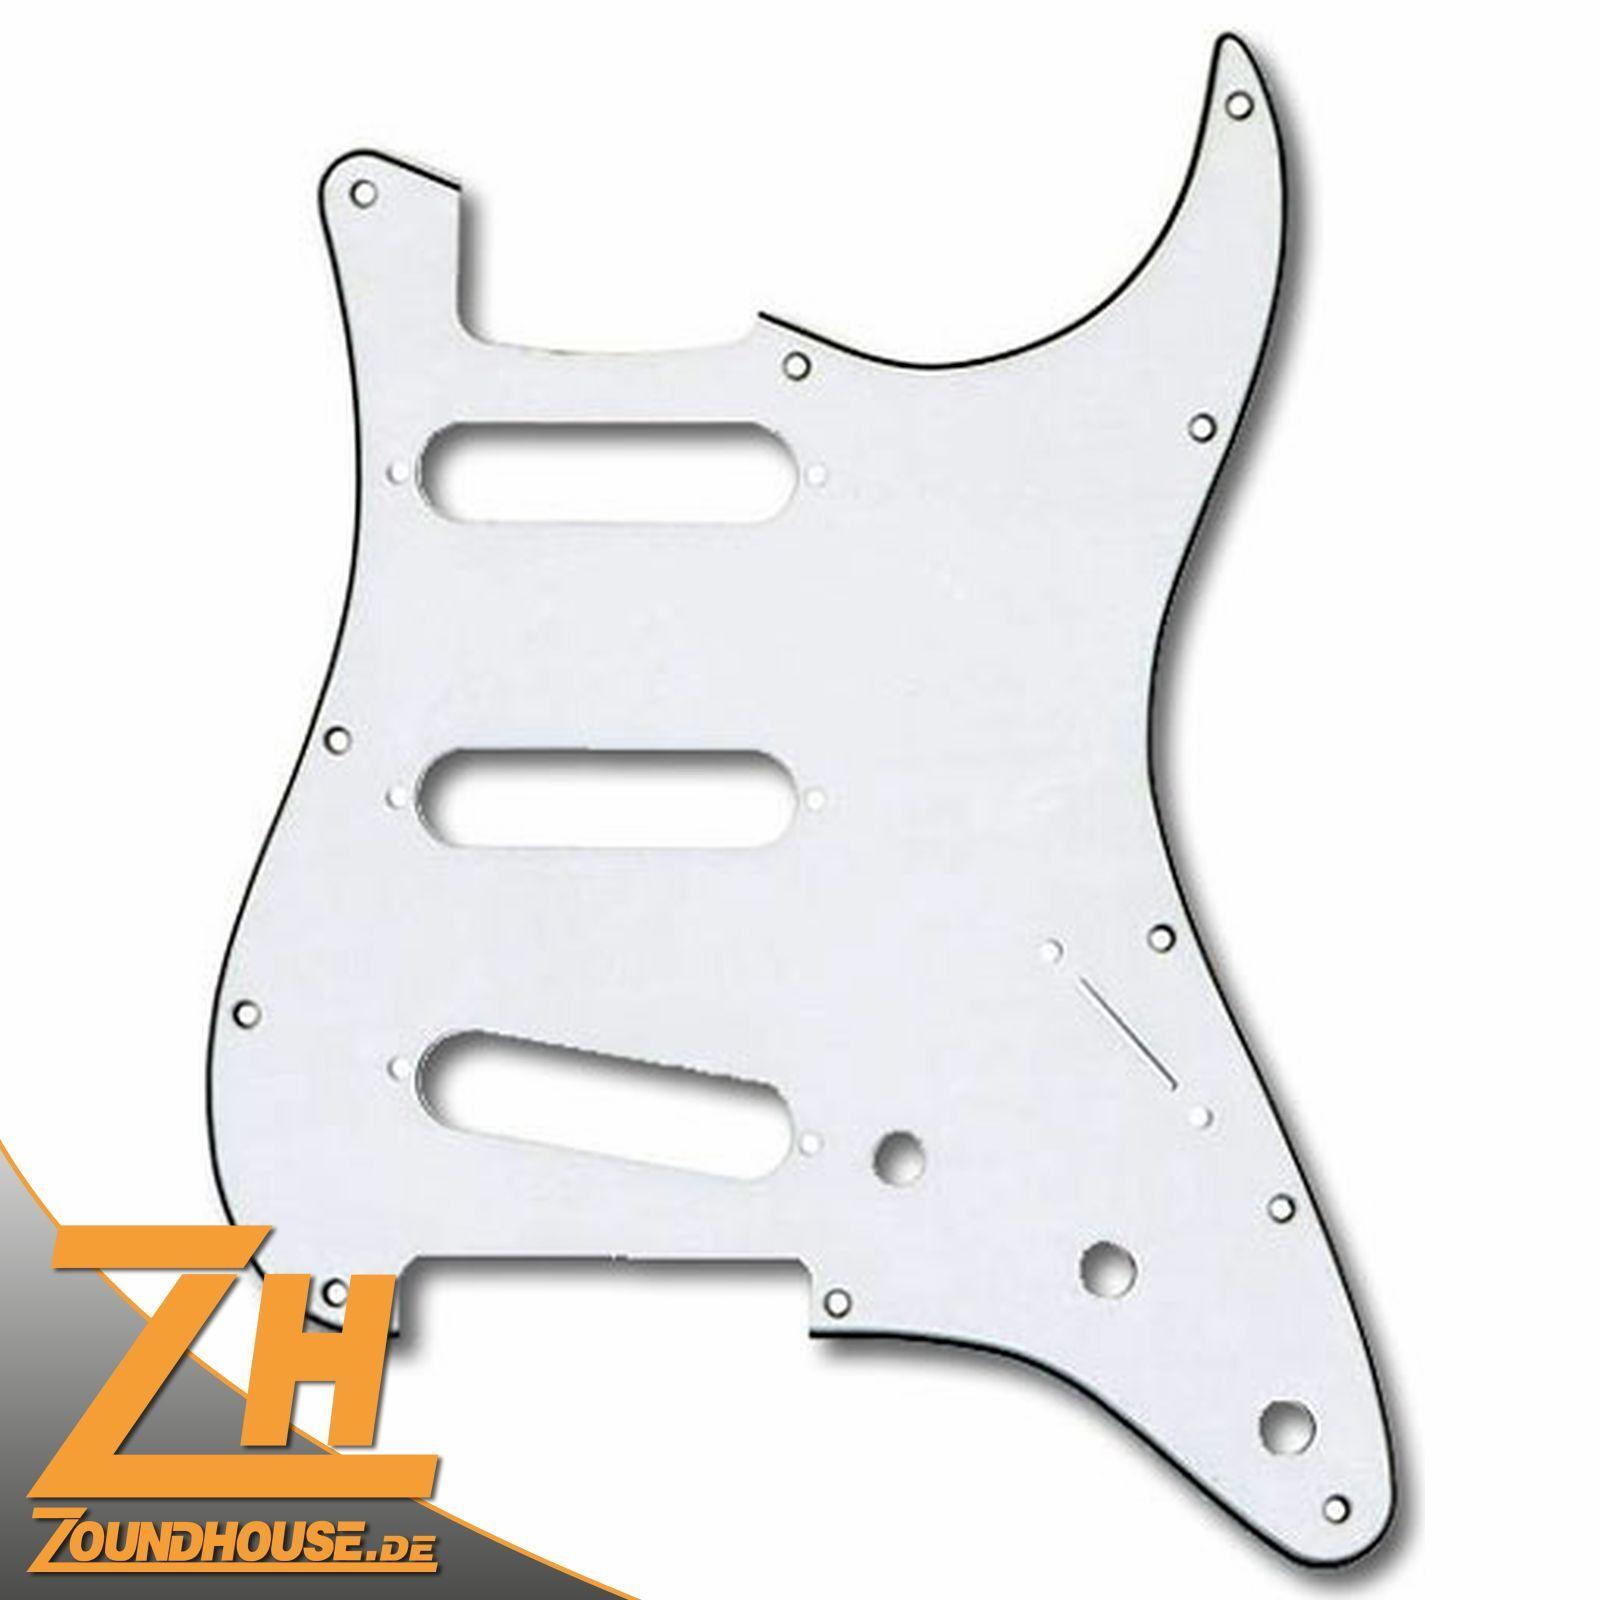 outlet Fender American Series Stratocaster battipenna SSS SSS SSS Parchment  vieni a scegliere il tuo stile sportivo